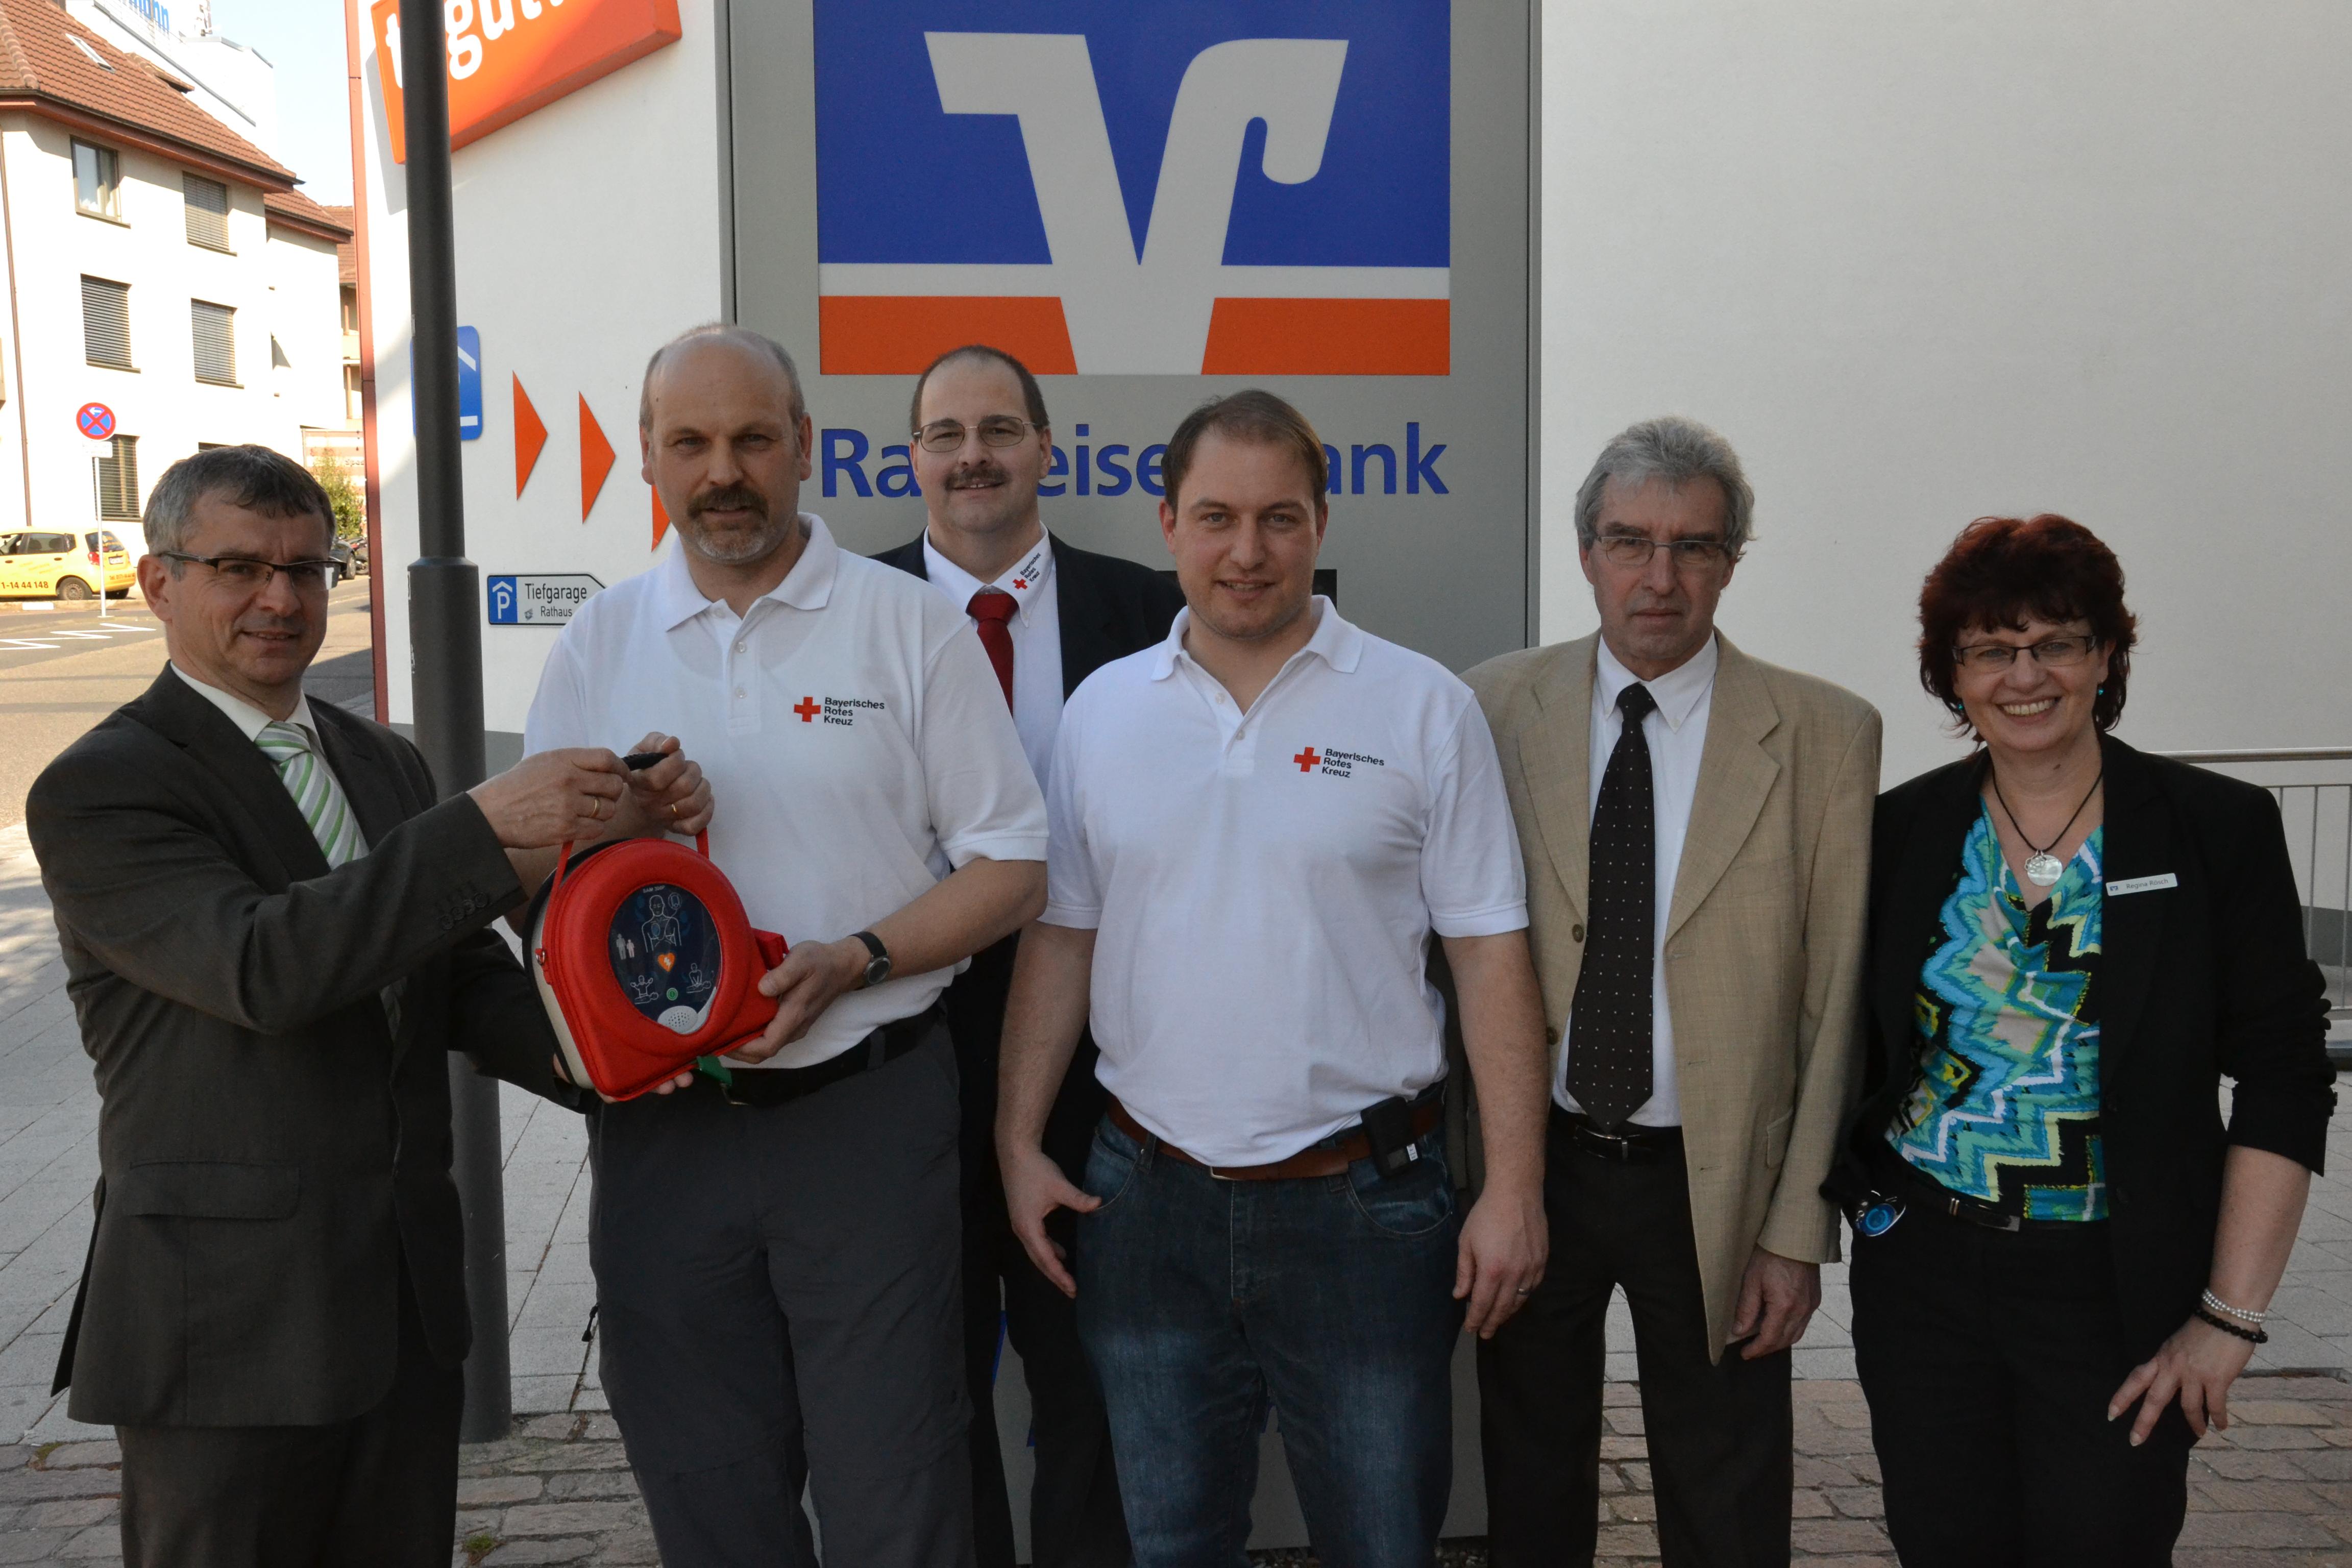 V.l.n.r. Markus Baumann (Raiba MSP), Klaus Hepp (BRK-Bereitschaft Homburg), Michael Behringer (BRK MSP-Bereitschaftsleiter), Sebastian Dürnagel (BRK-Bereitschaft Homburg), Roland Albus (Geschäftsführer BRK MSP), Regina Röesch (Raiba MSP)